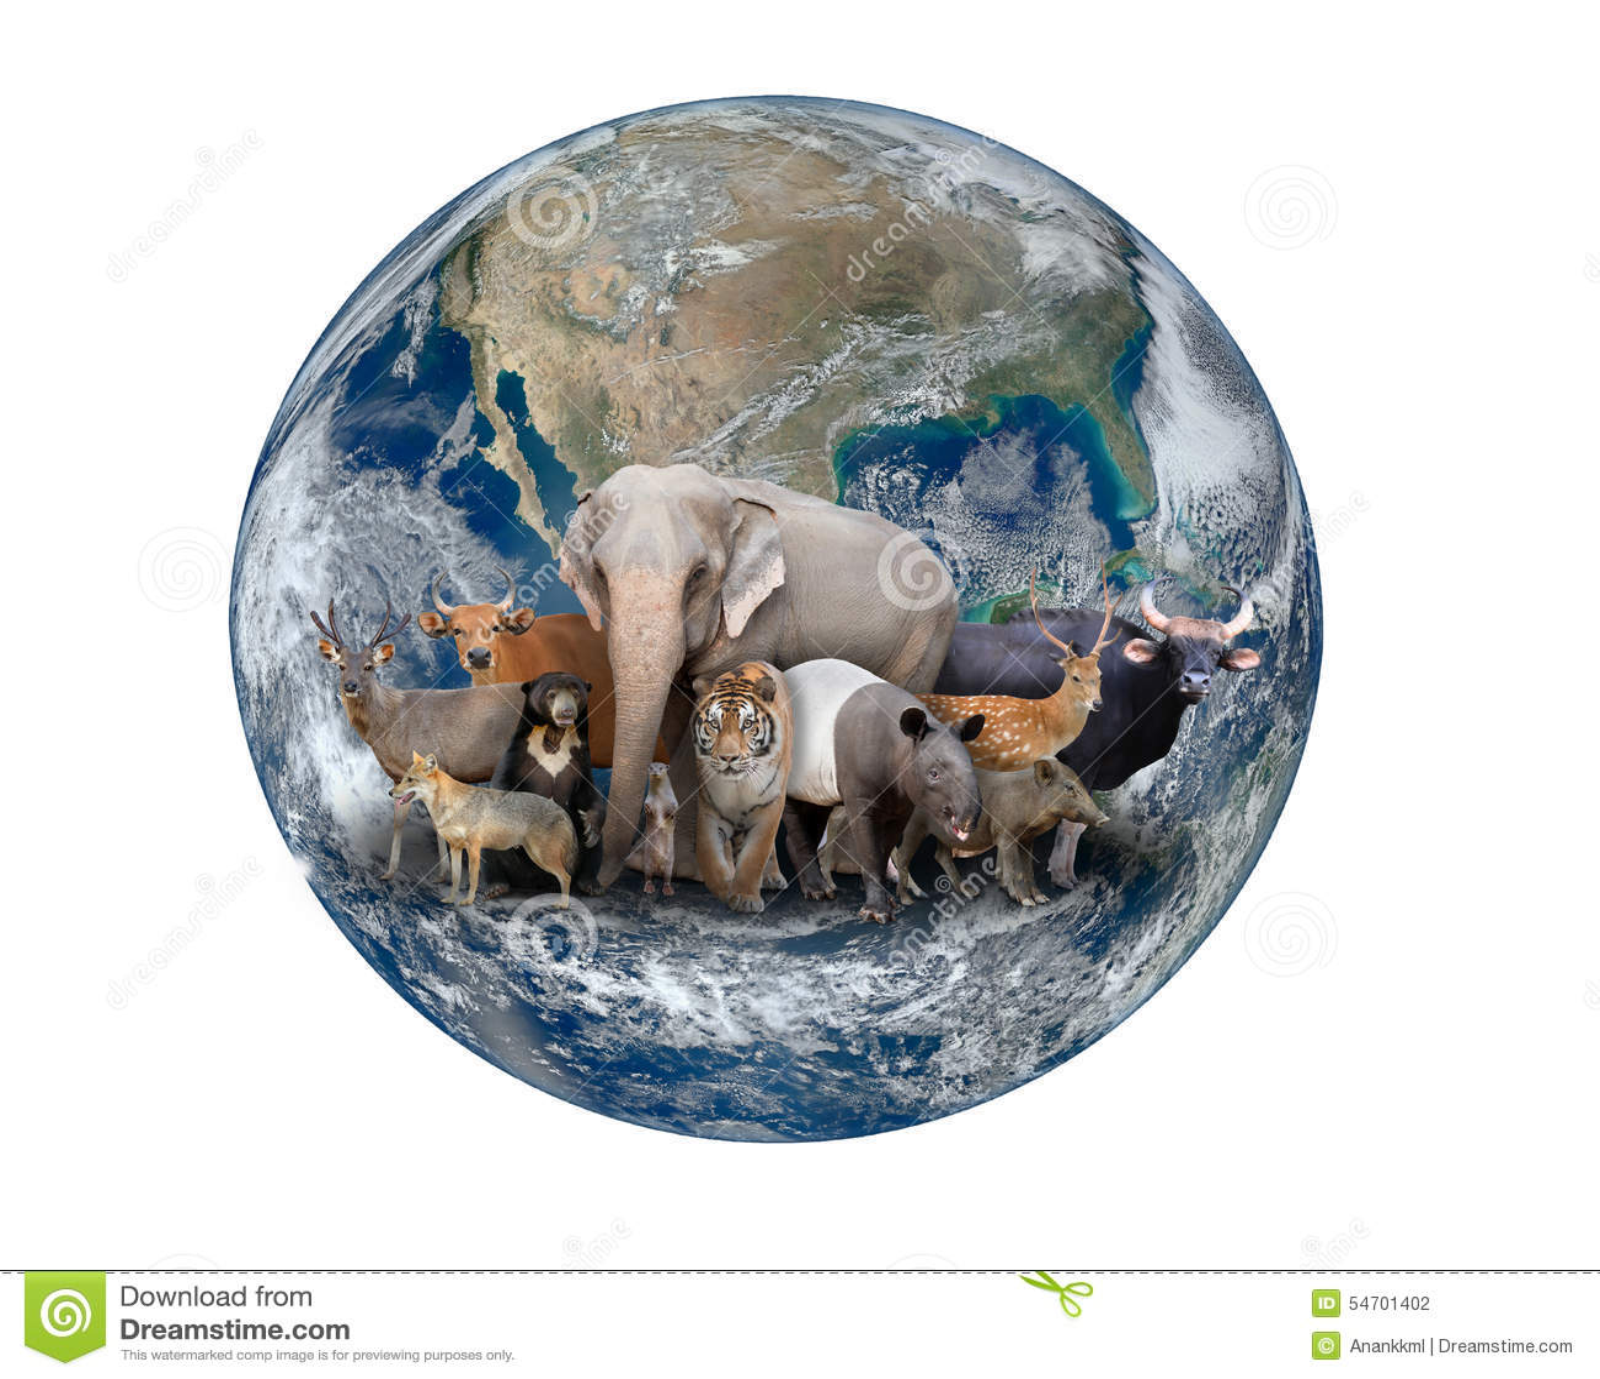 planet earth animals - photo #3